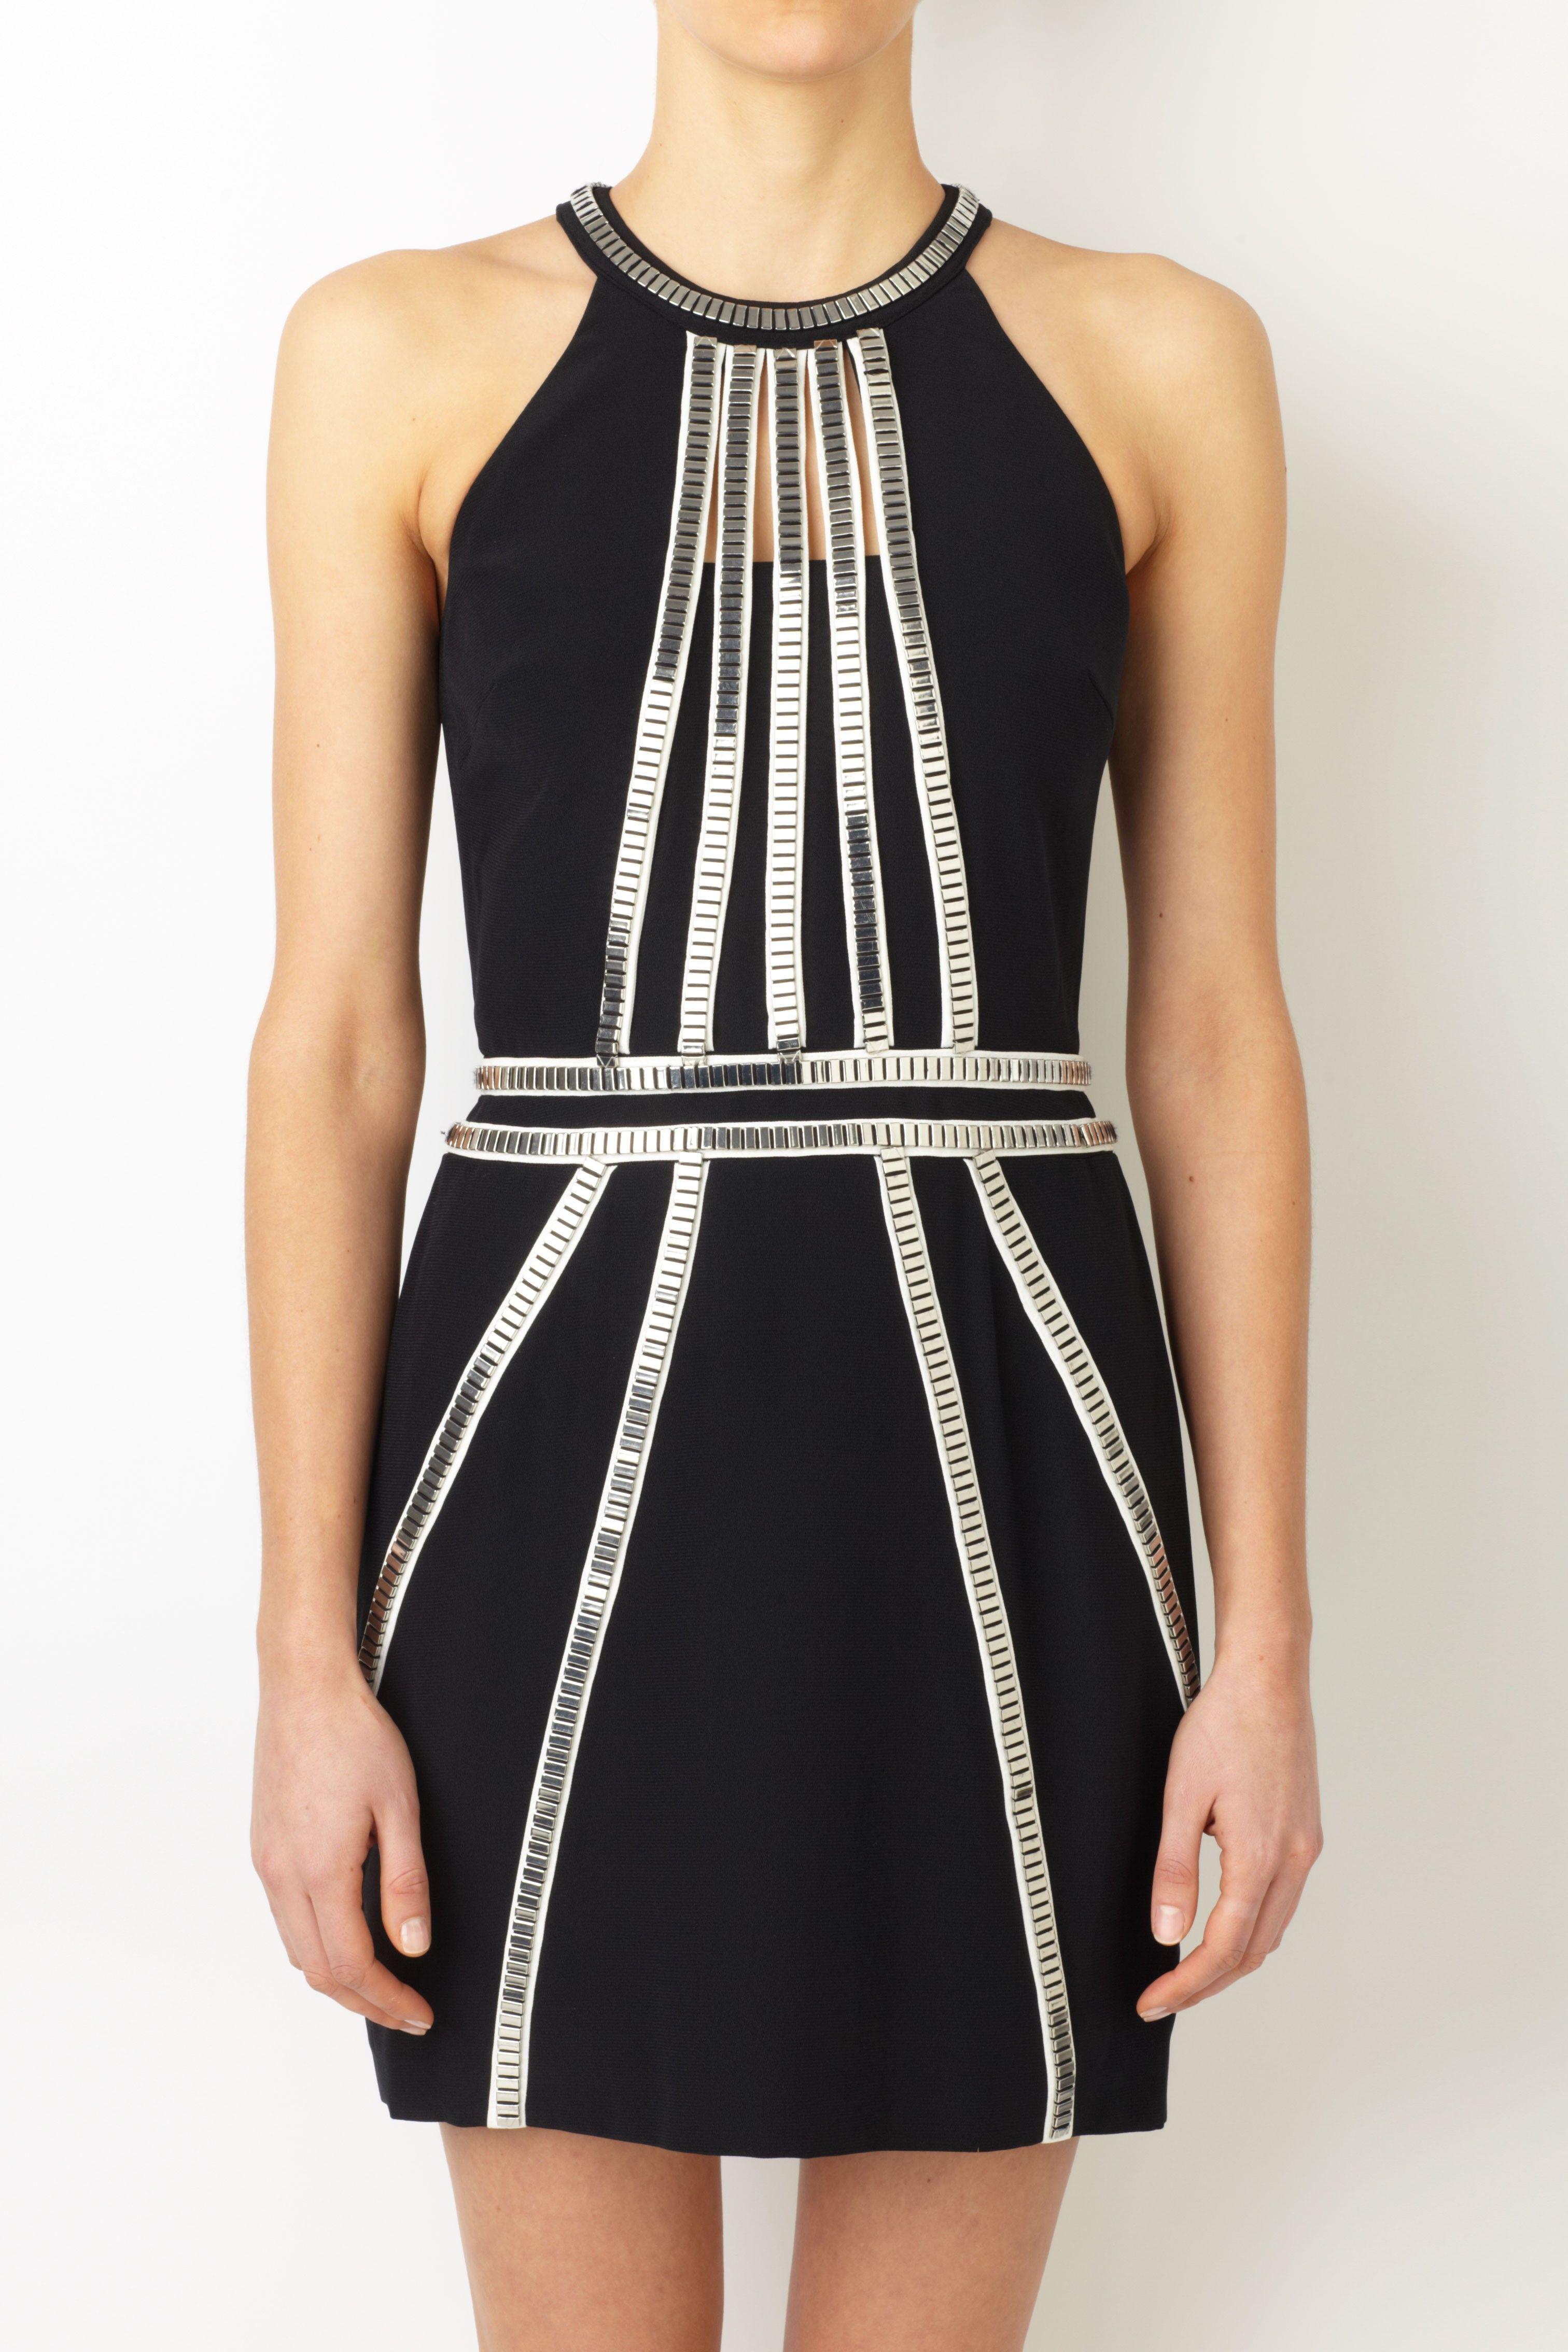 Sass Bide The Top Dog Black Silver Dresses Sass Bide Clothes Design Clothes For Women Fashion